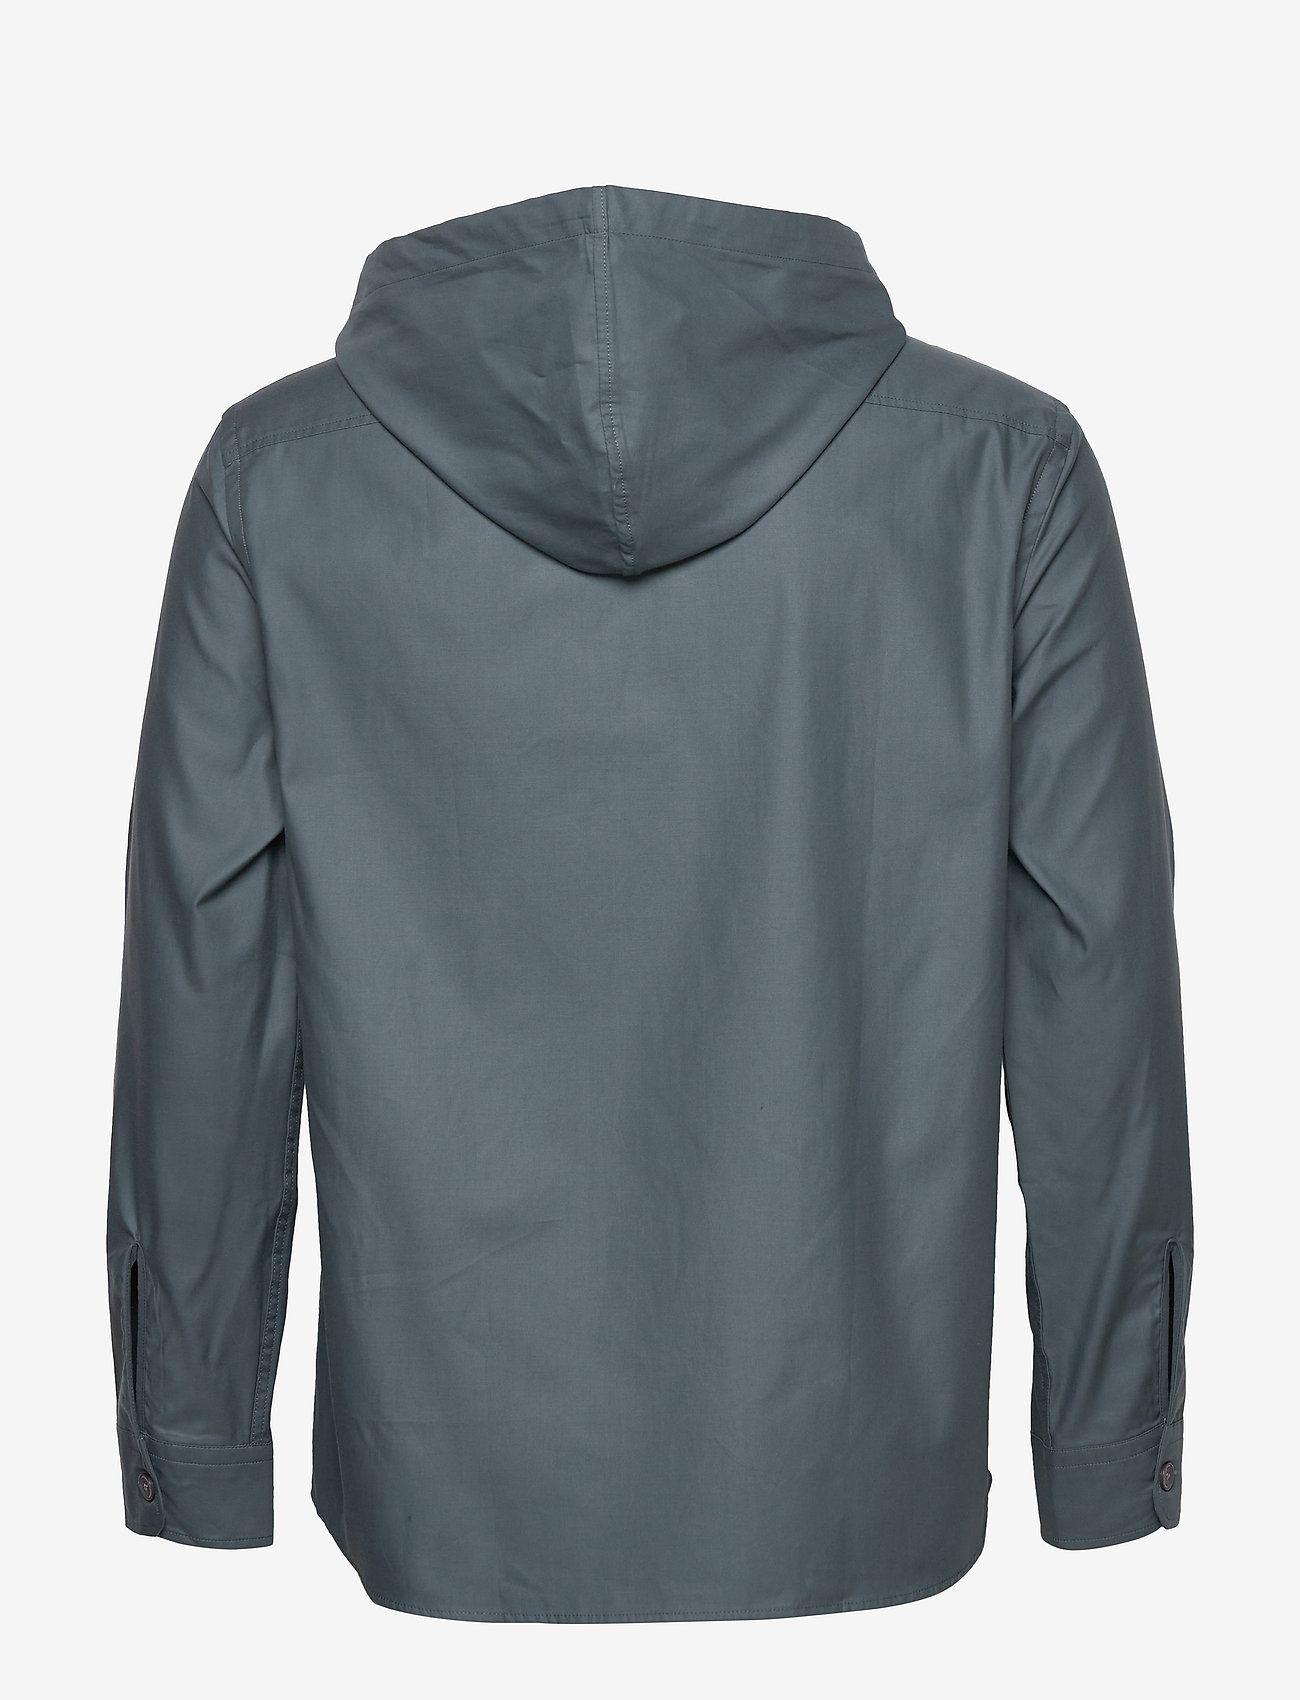 M. Kit Hooded Jacket (Charcoal B) (120 €) - Filippa K LCJo5